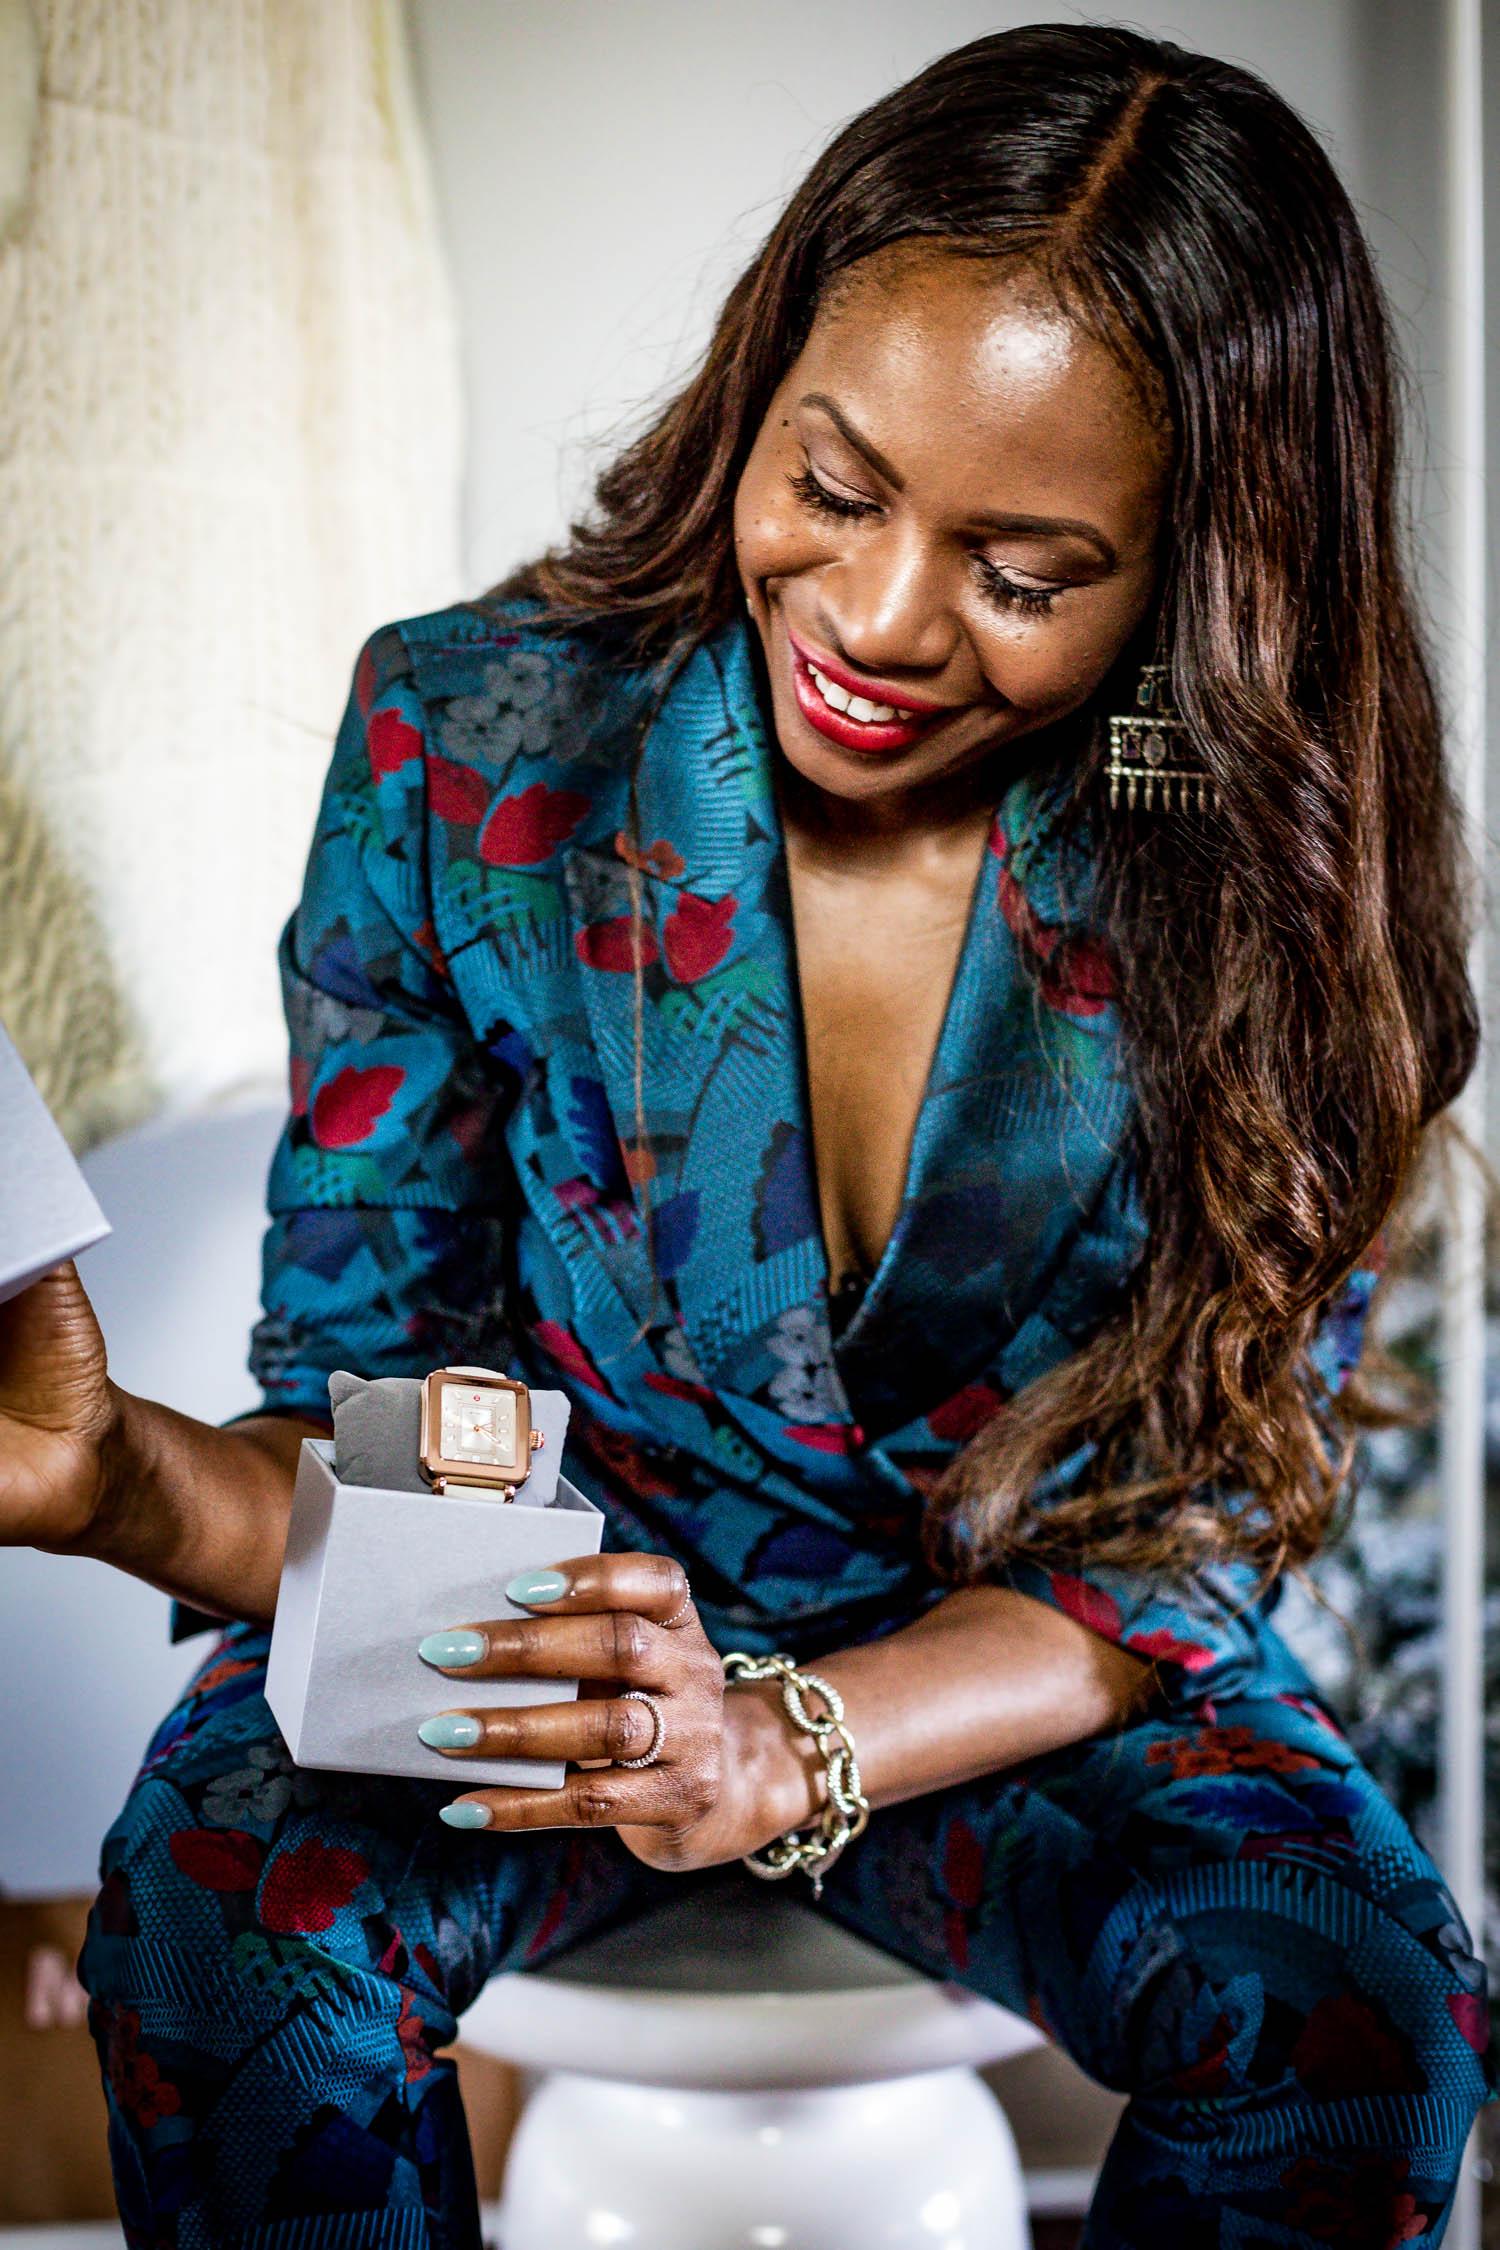 Atlanta fashion blogger Monica Awe-Etuk gives away Michele Watch